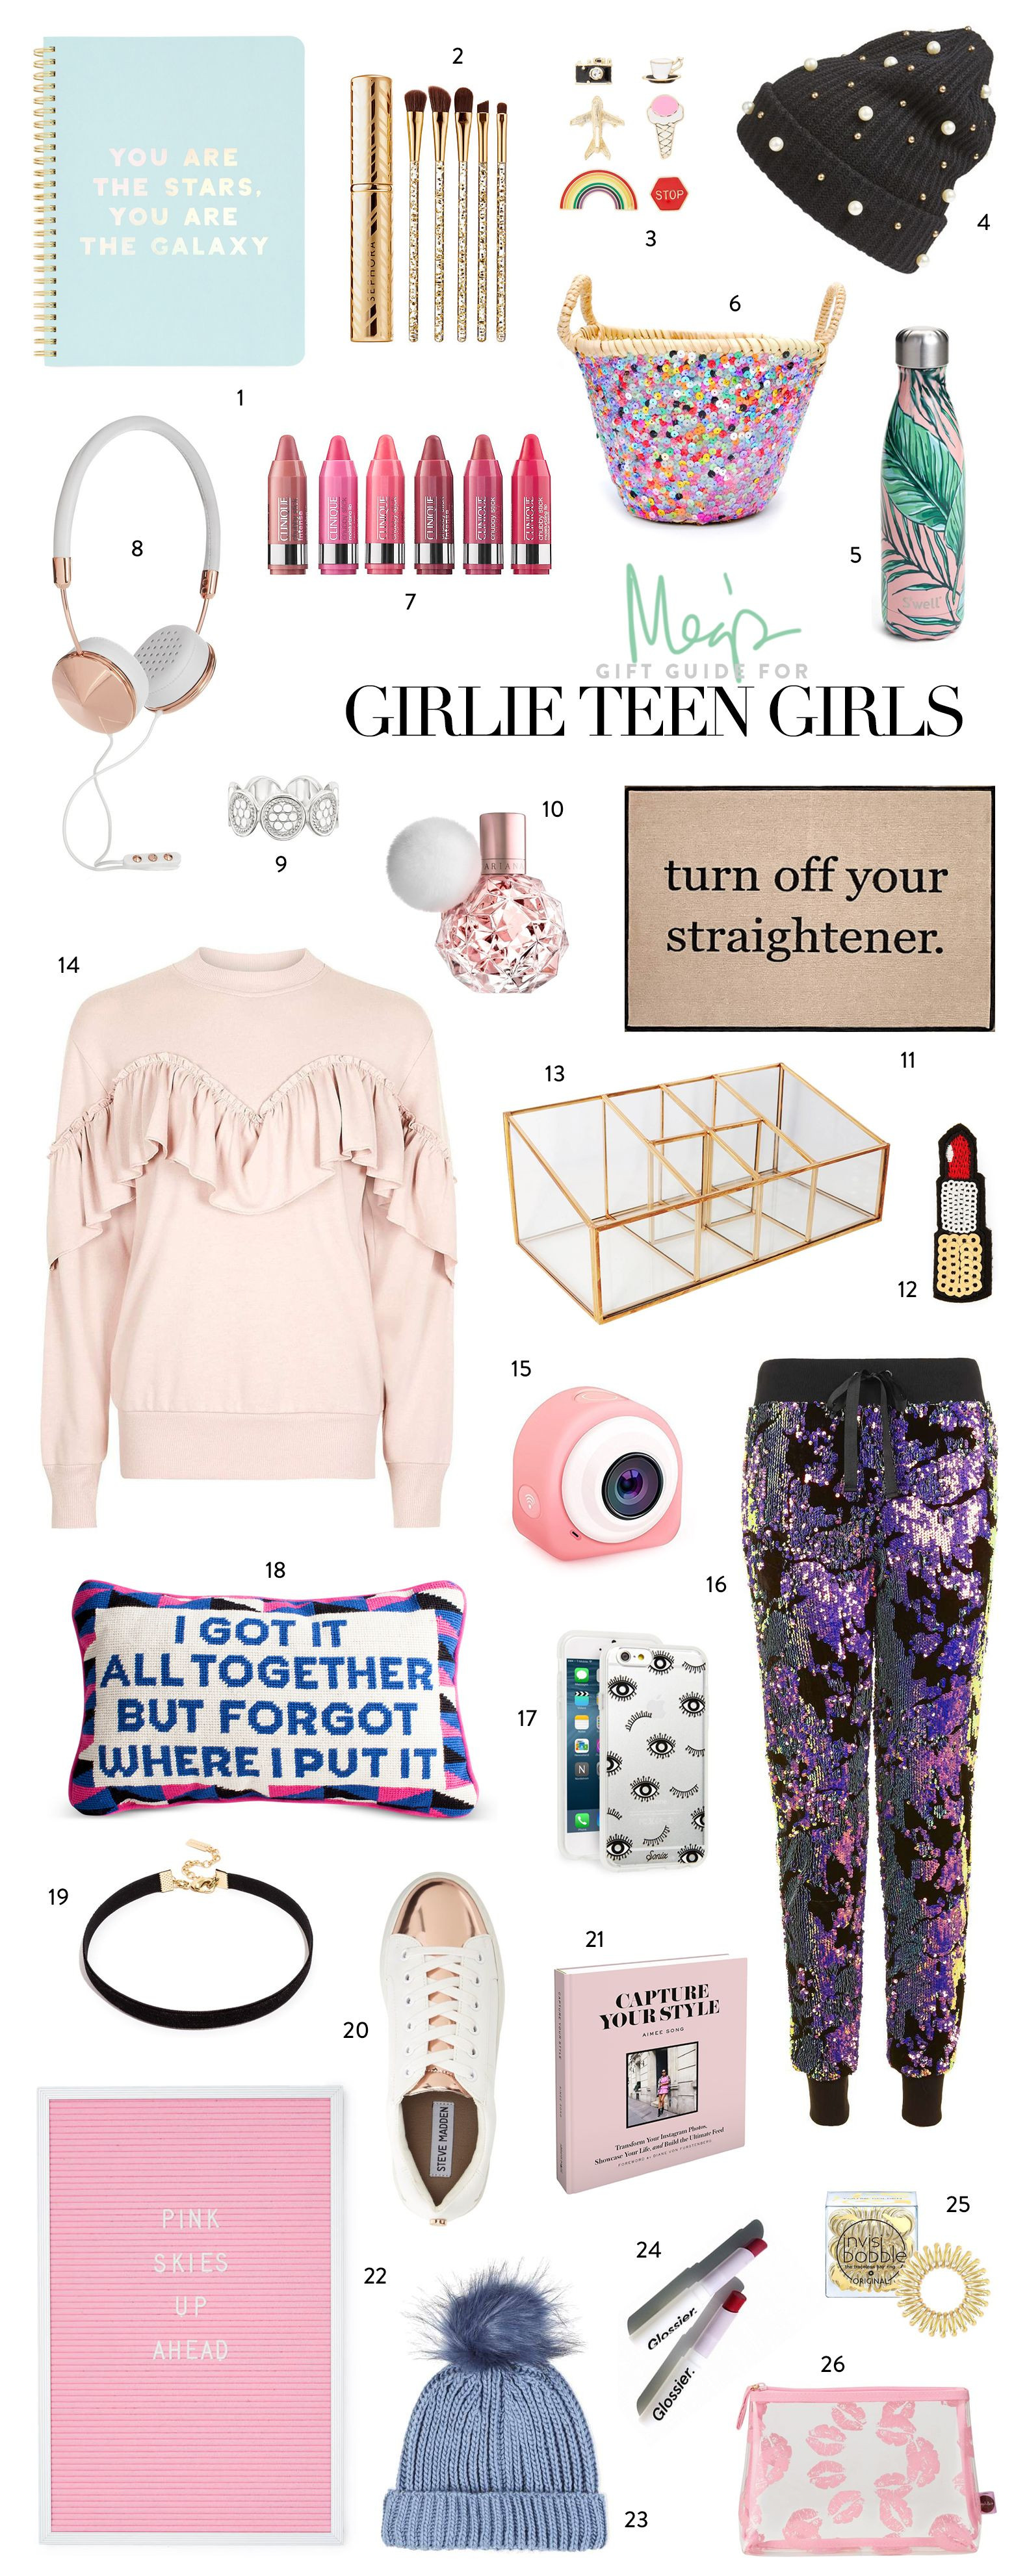 Gift Ideas For Teenage Girls  Holiday Gift Guide Girlie Teen Girls